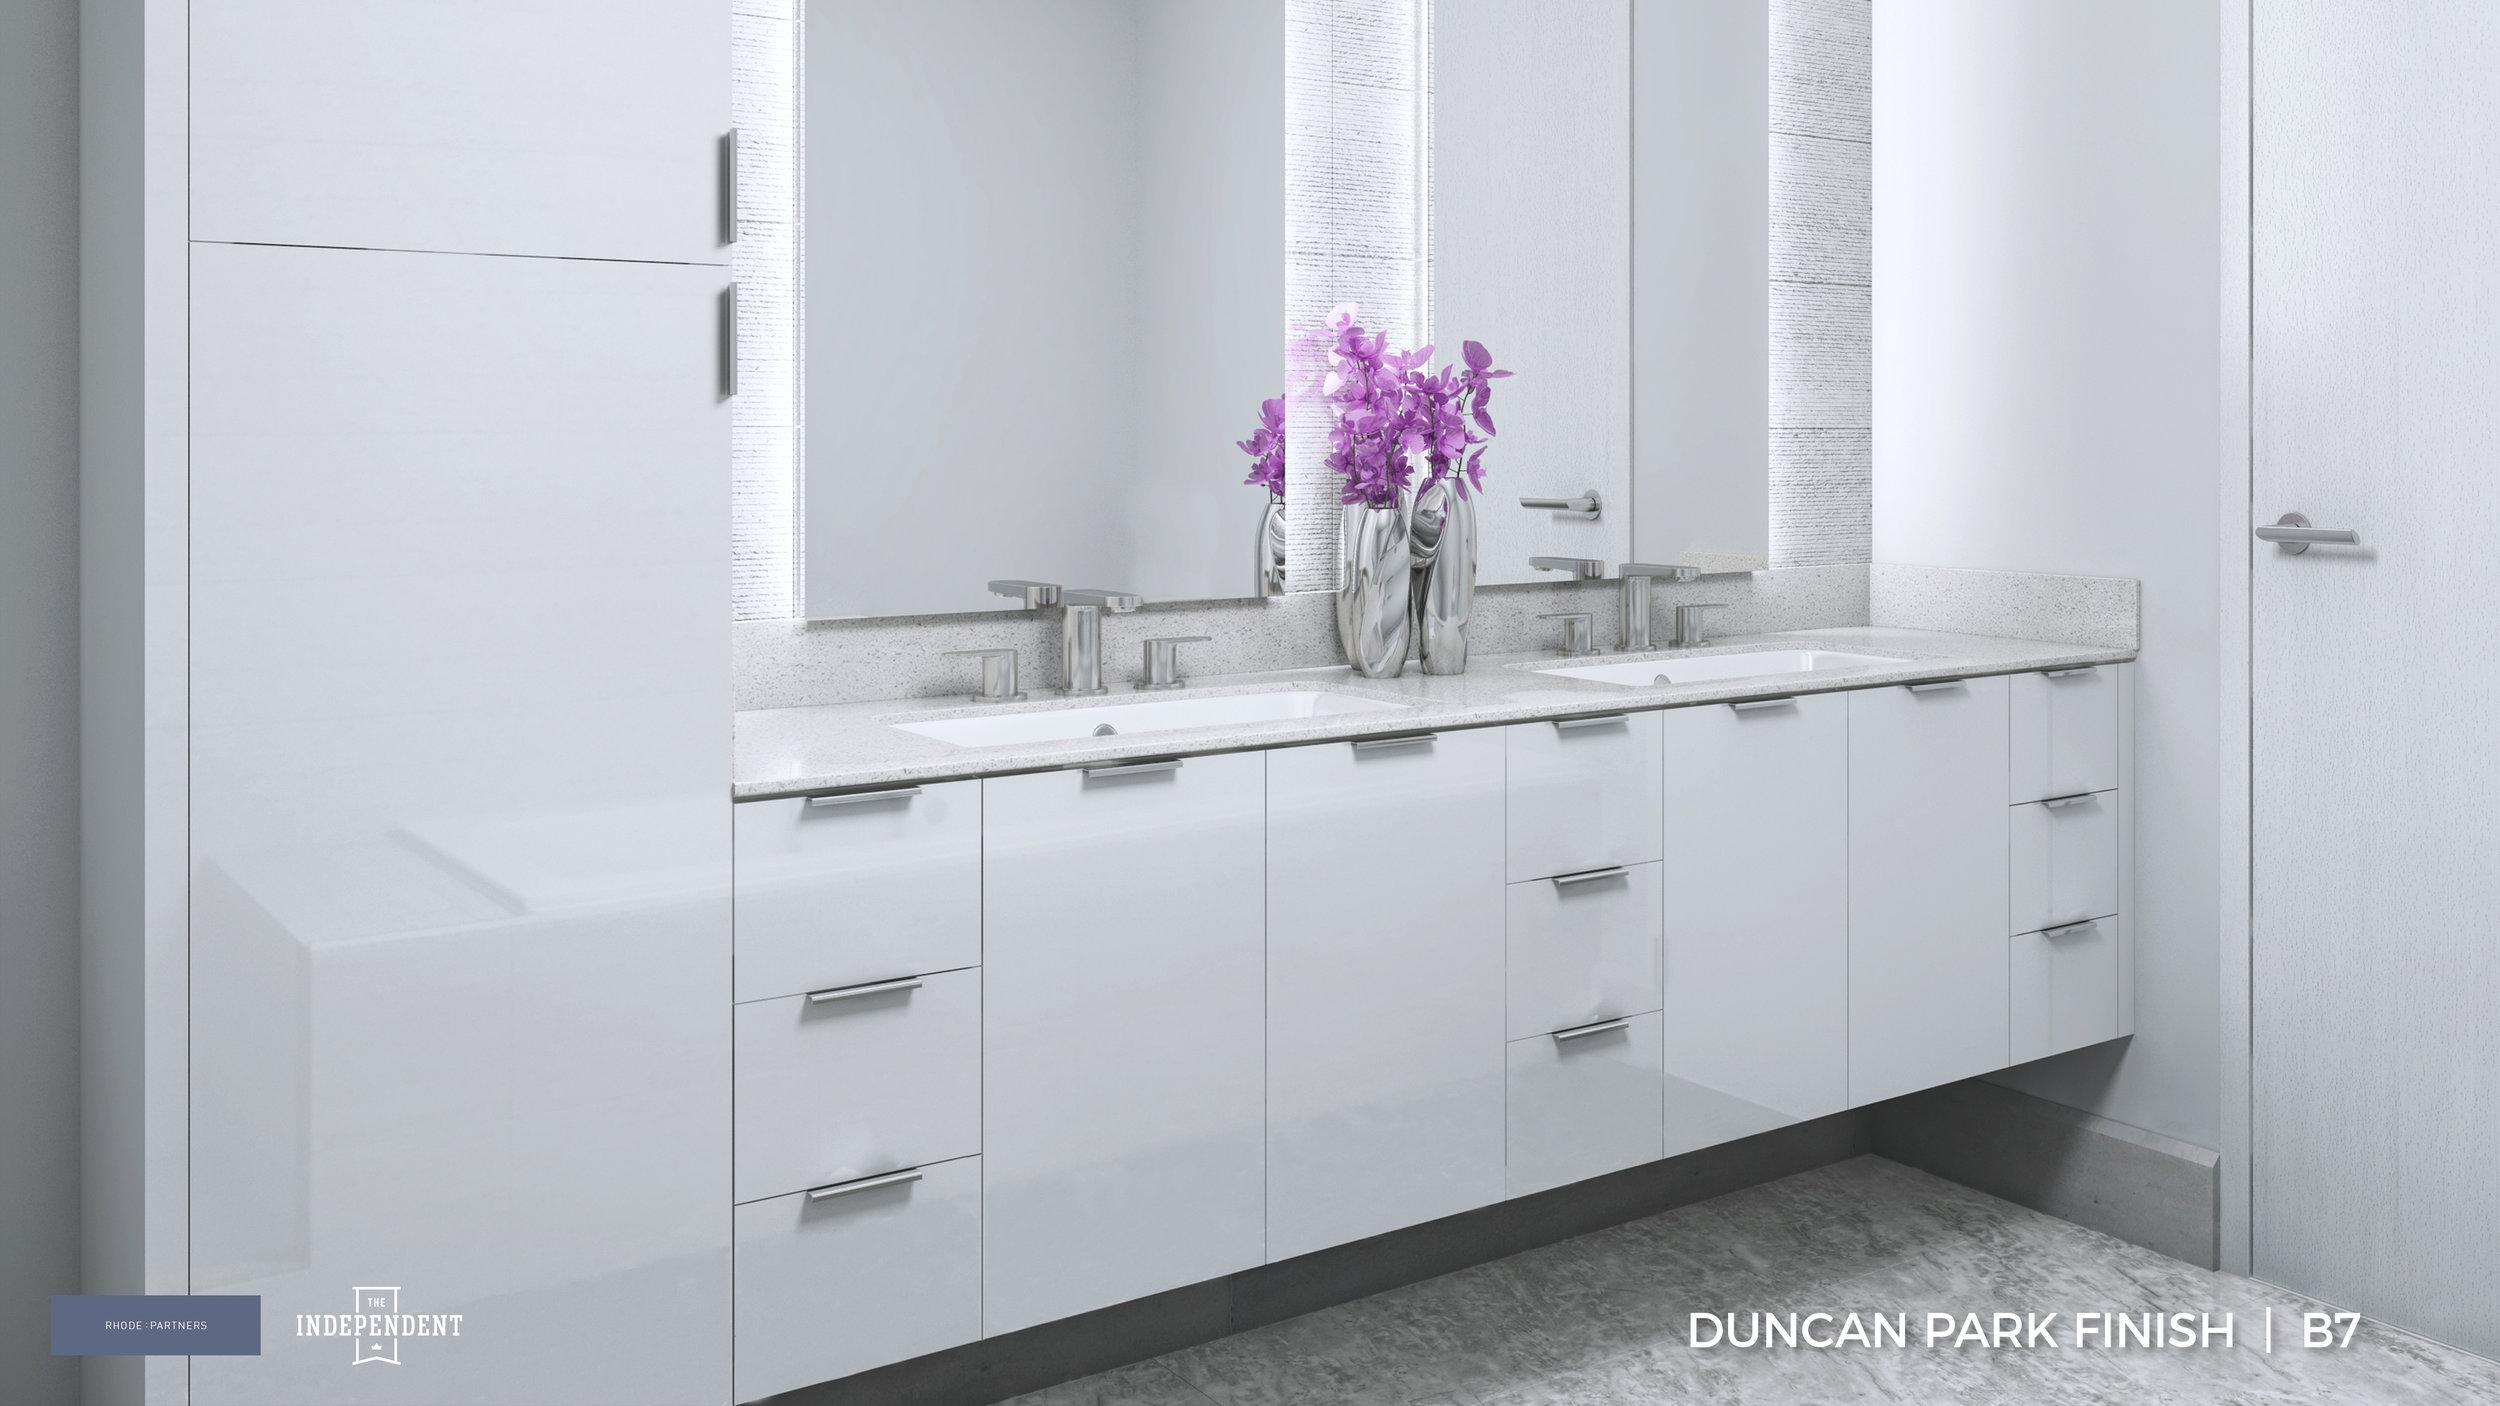 Interior Finishes 3 - Duncan Park B7 Master Bath.jpg